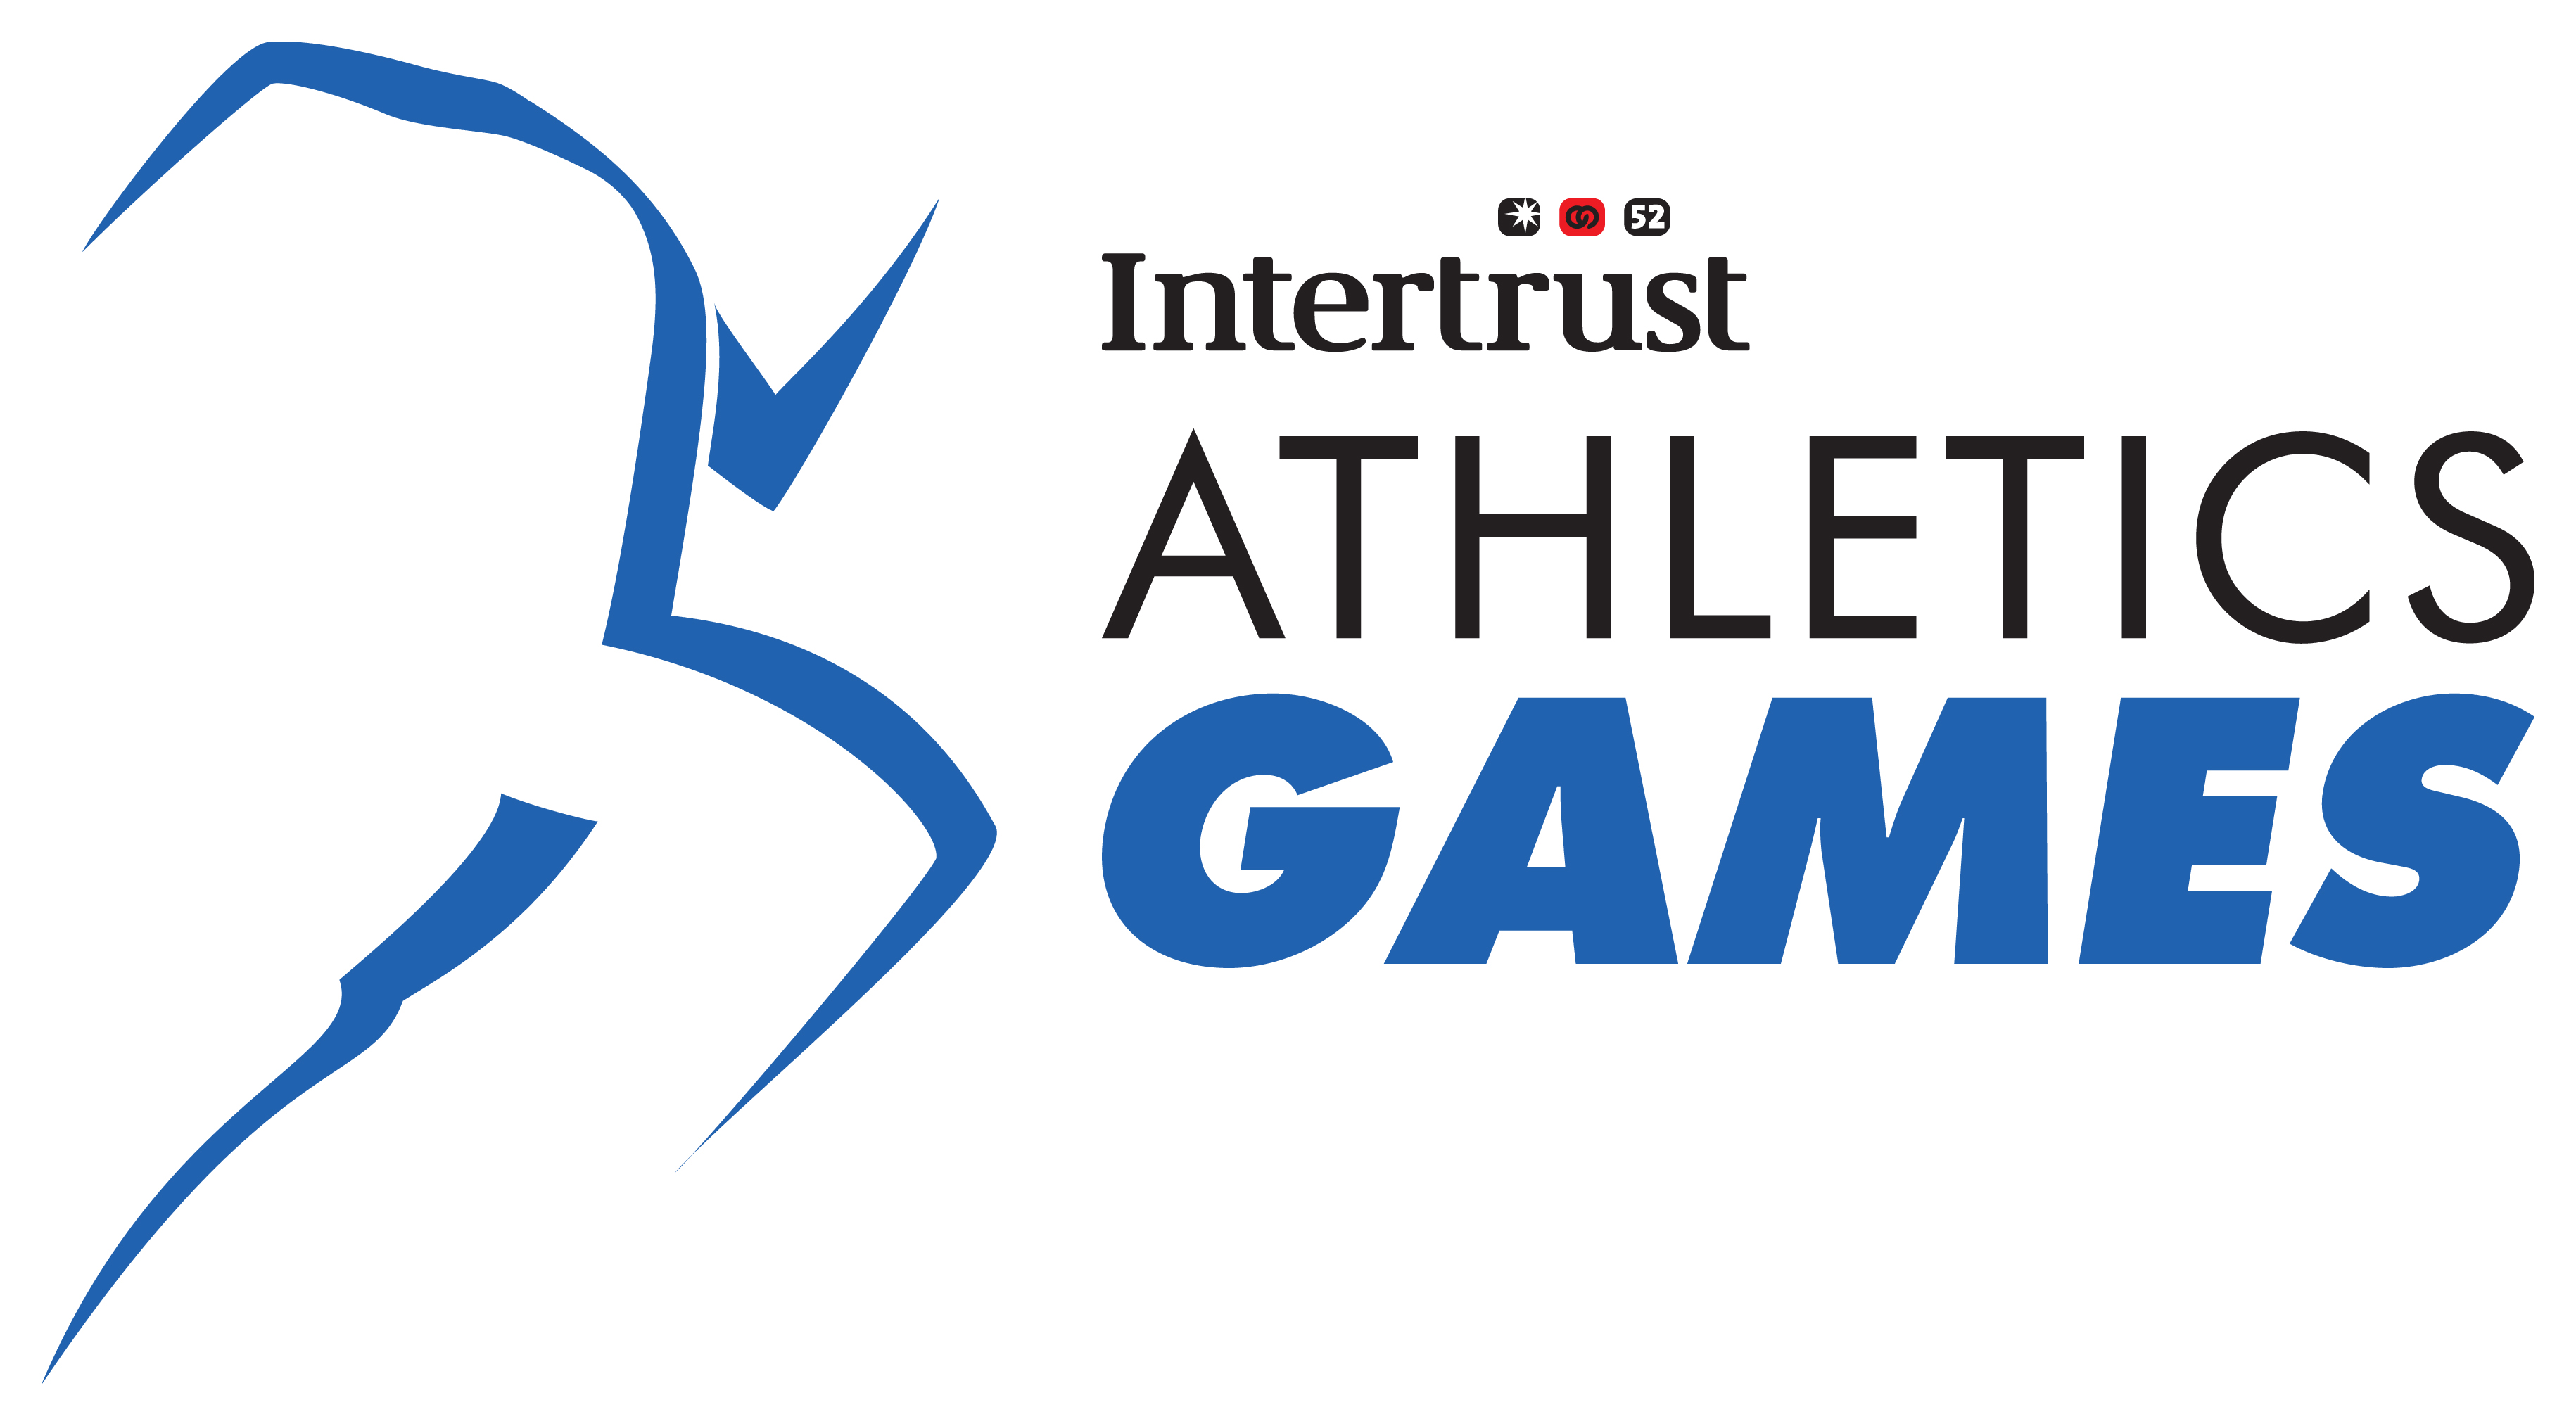 Intertrust Athletics Games – Online Entry open